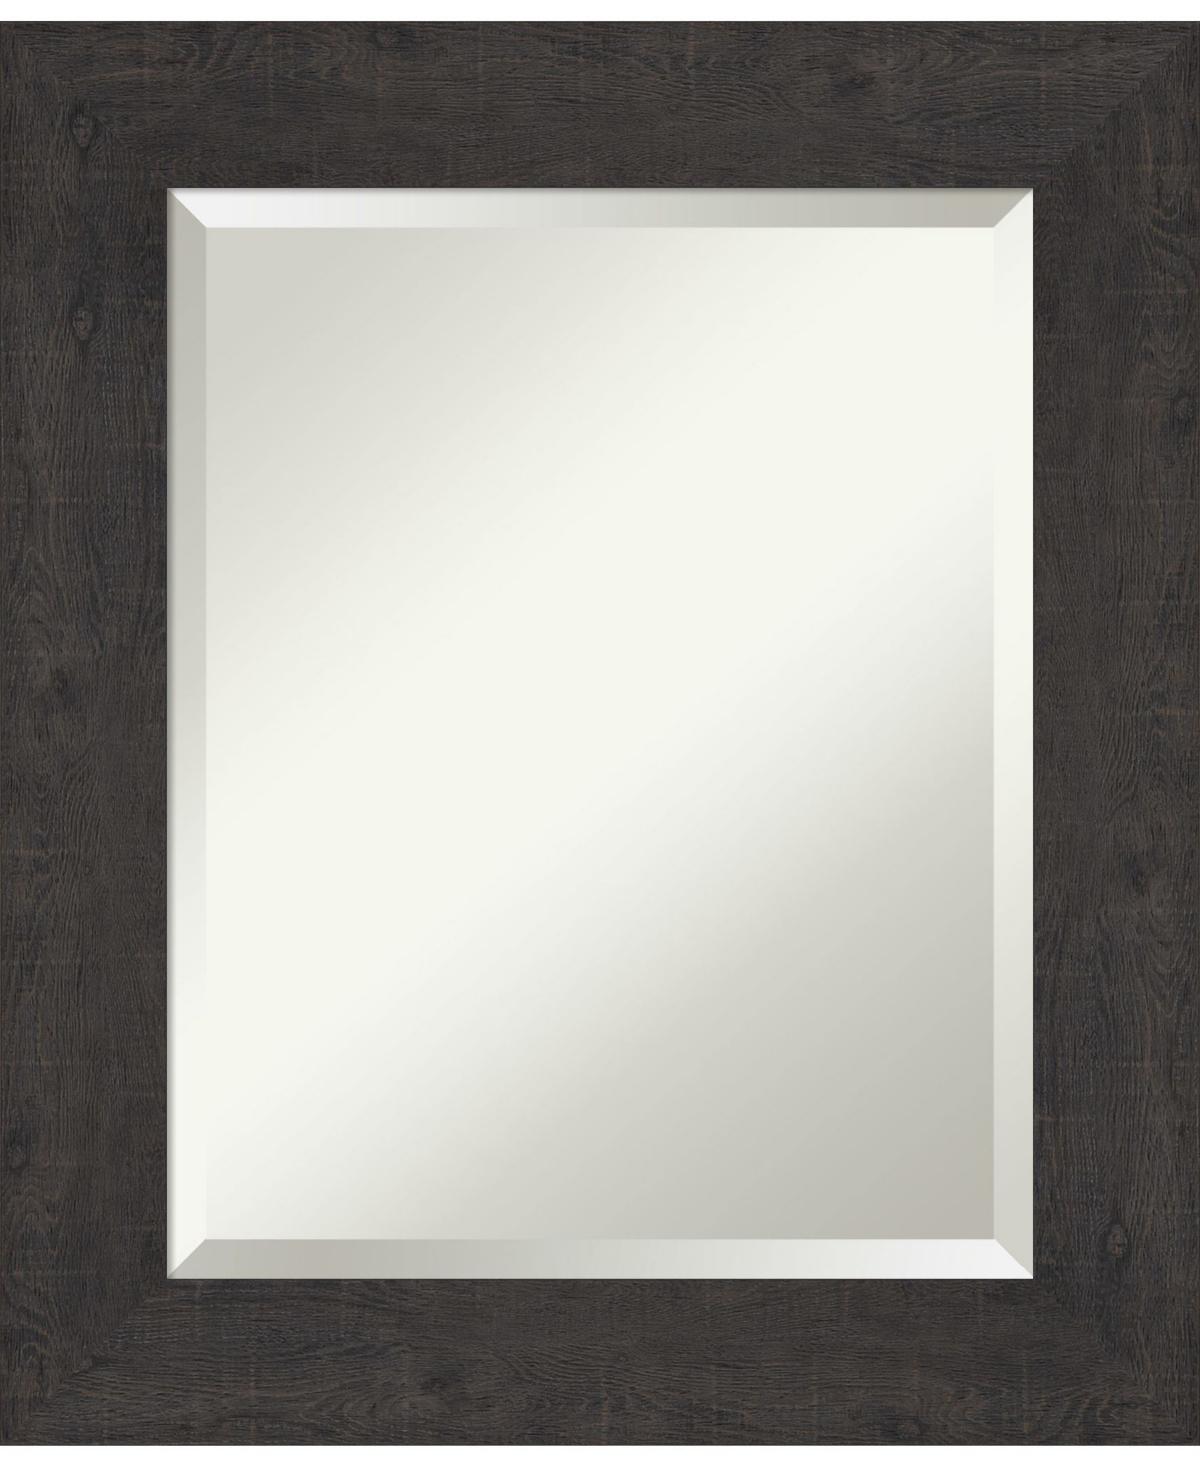 Amanti Art Rustic Plank Framed Bathroom Vanity Wall Mirror, 21.38